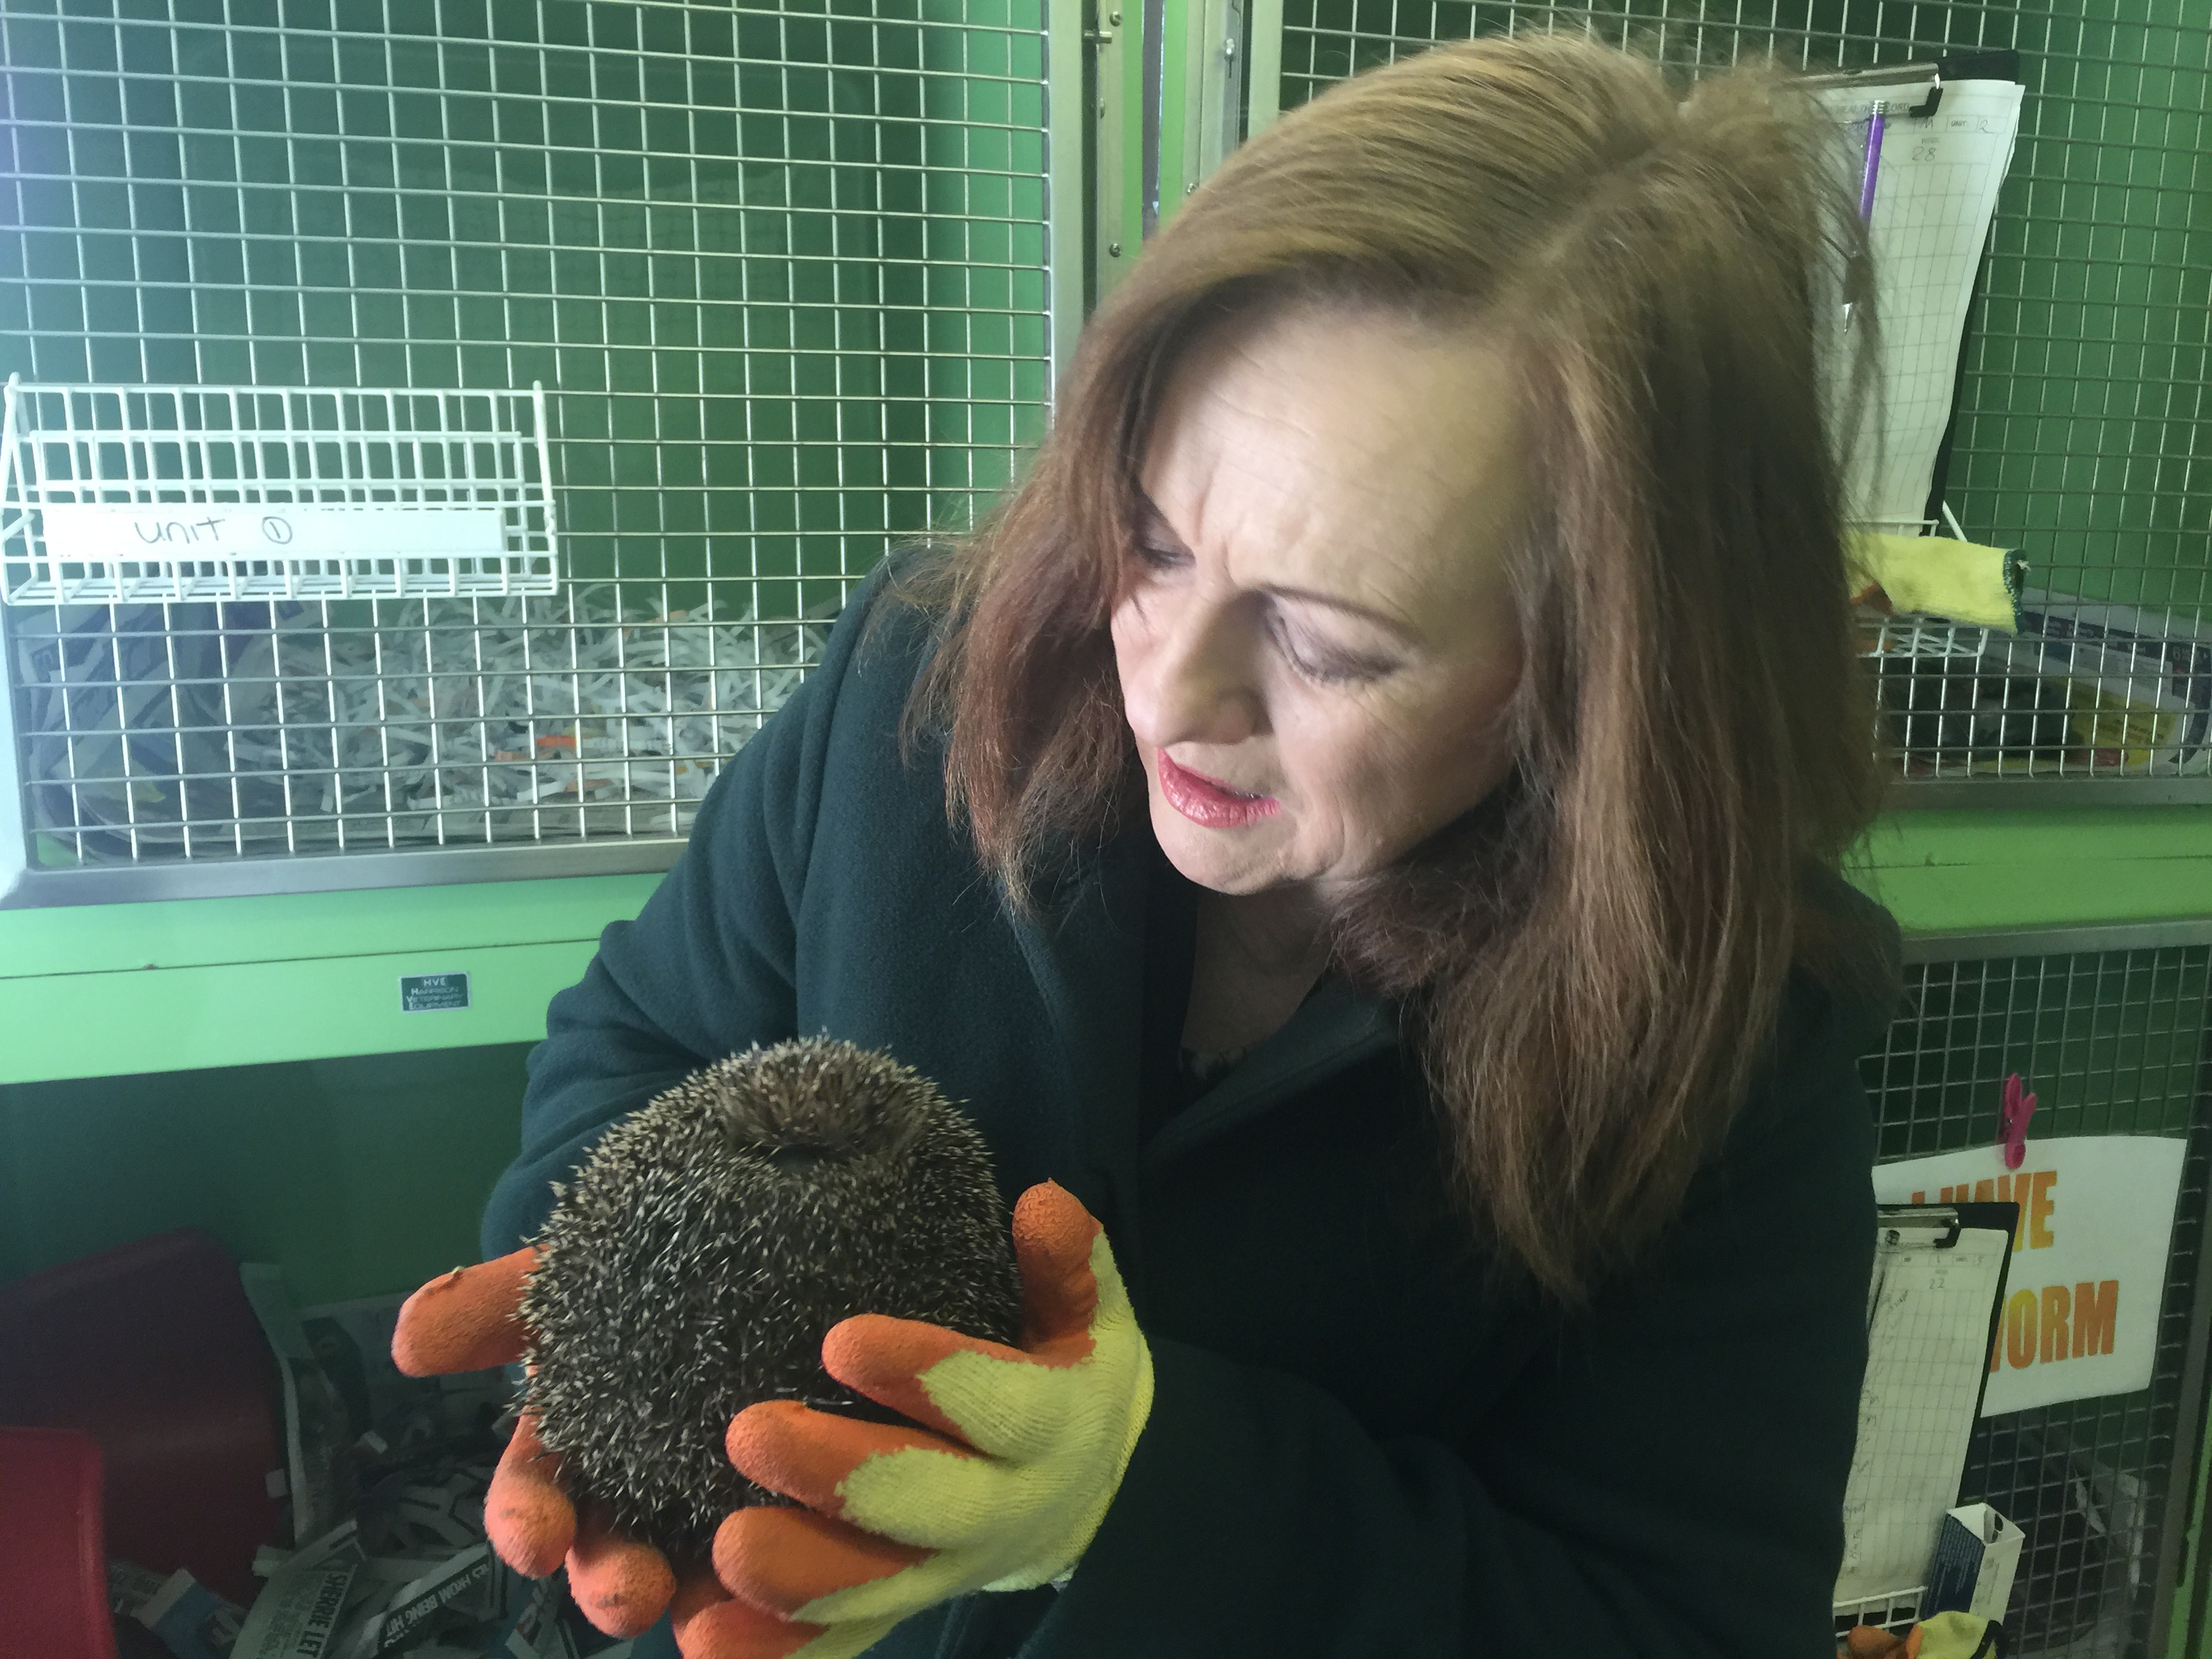 Joan_with_Harvey_the_Hedgehog.JPG